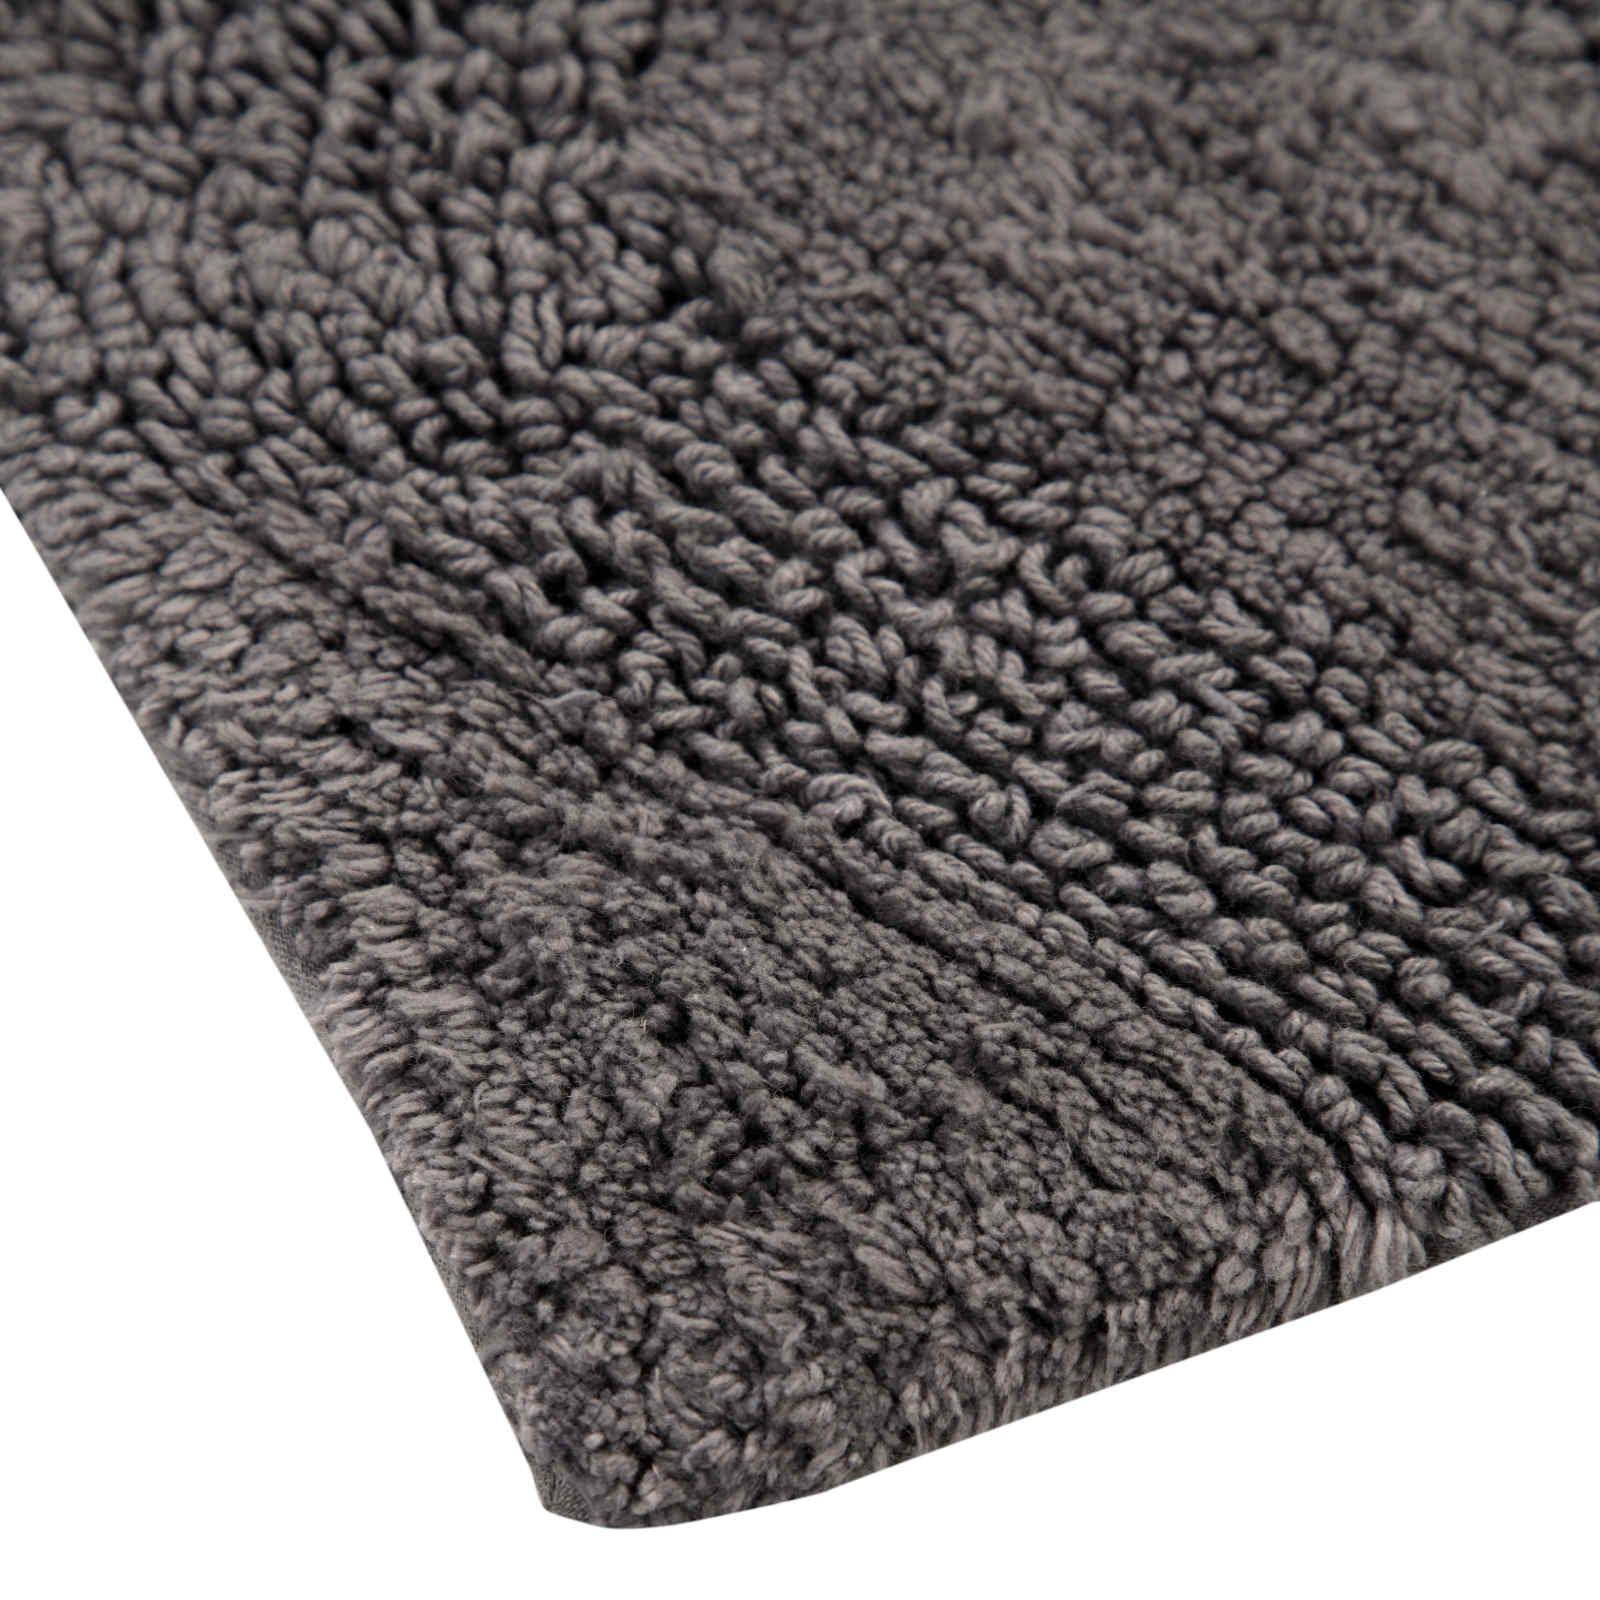 Bathroom Rugs Modern: Chevron 100% Cotton Modern Bath Mat Luxury Shower Mats